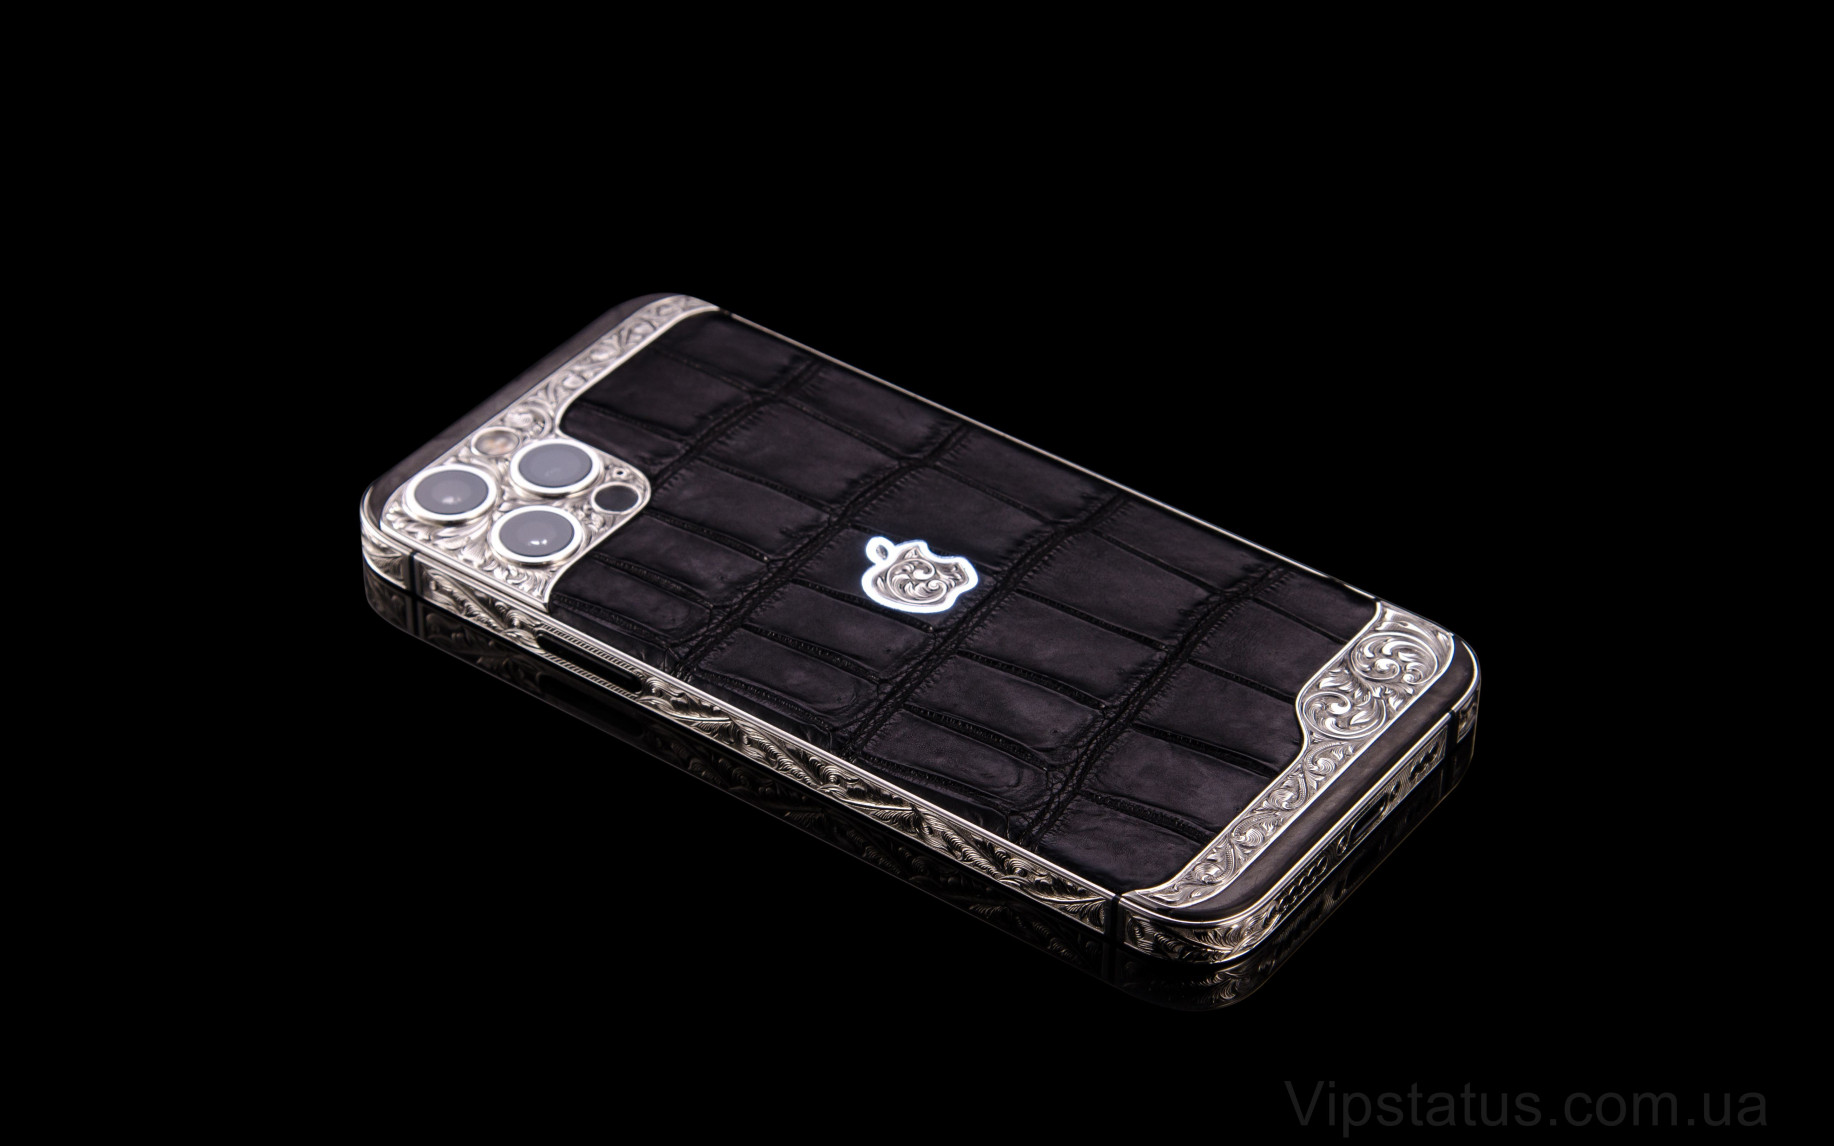 Elite Black Shadow IPHONE 12 PRO MAX 512 GB Black Shadow IPHONE 12 PRO MAX 512 GB image 3